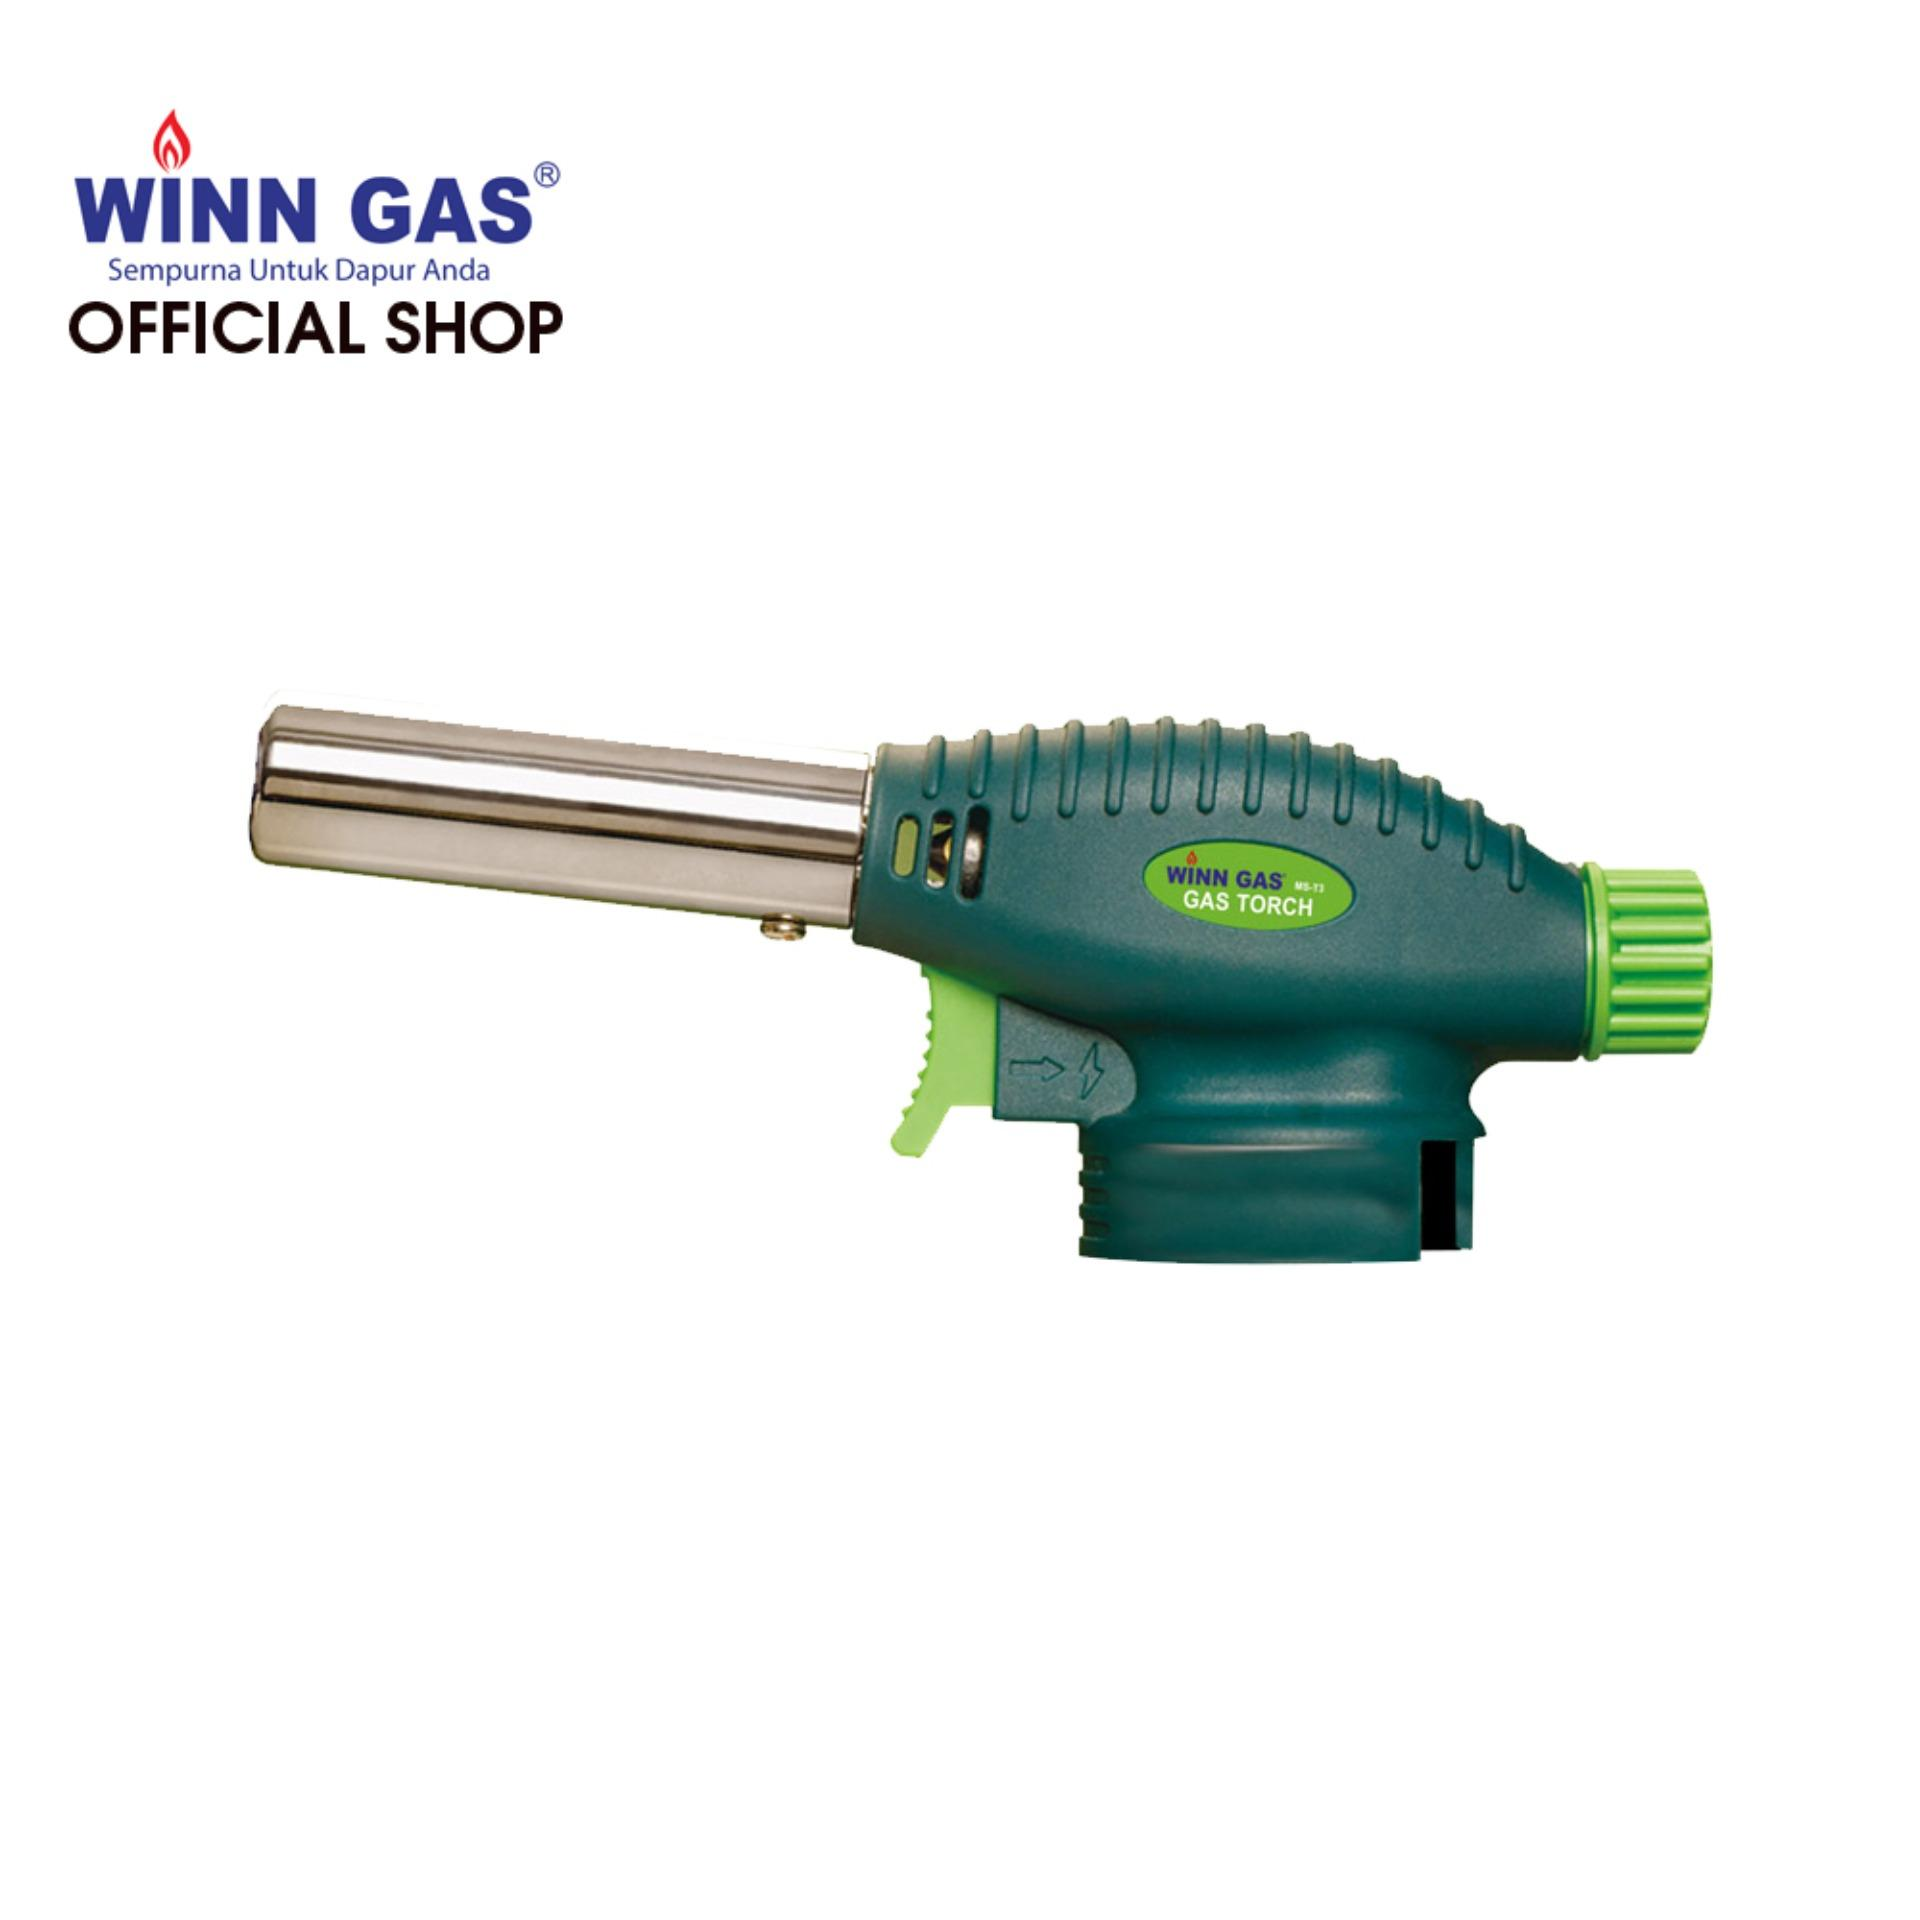 Jual Produk Winn Gas Terlengkap Kompor Dg154 Hitam Torch 503c Alat Pembakaran Hijau